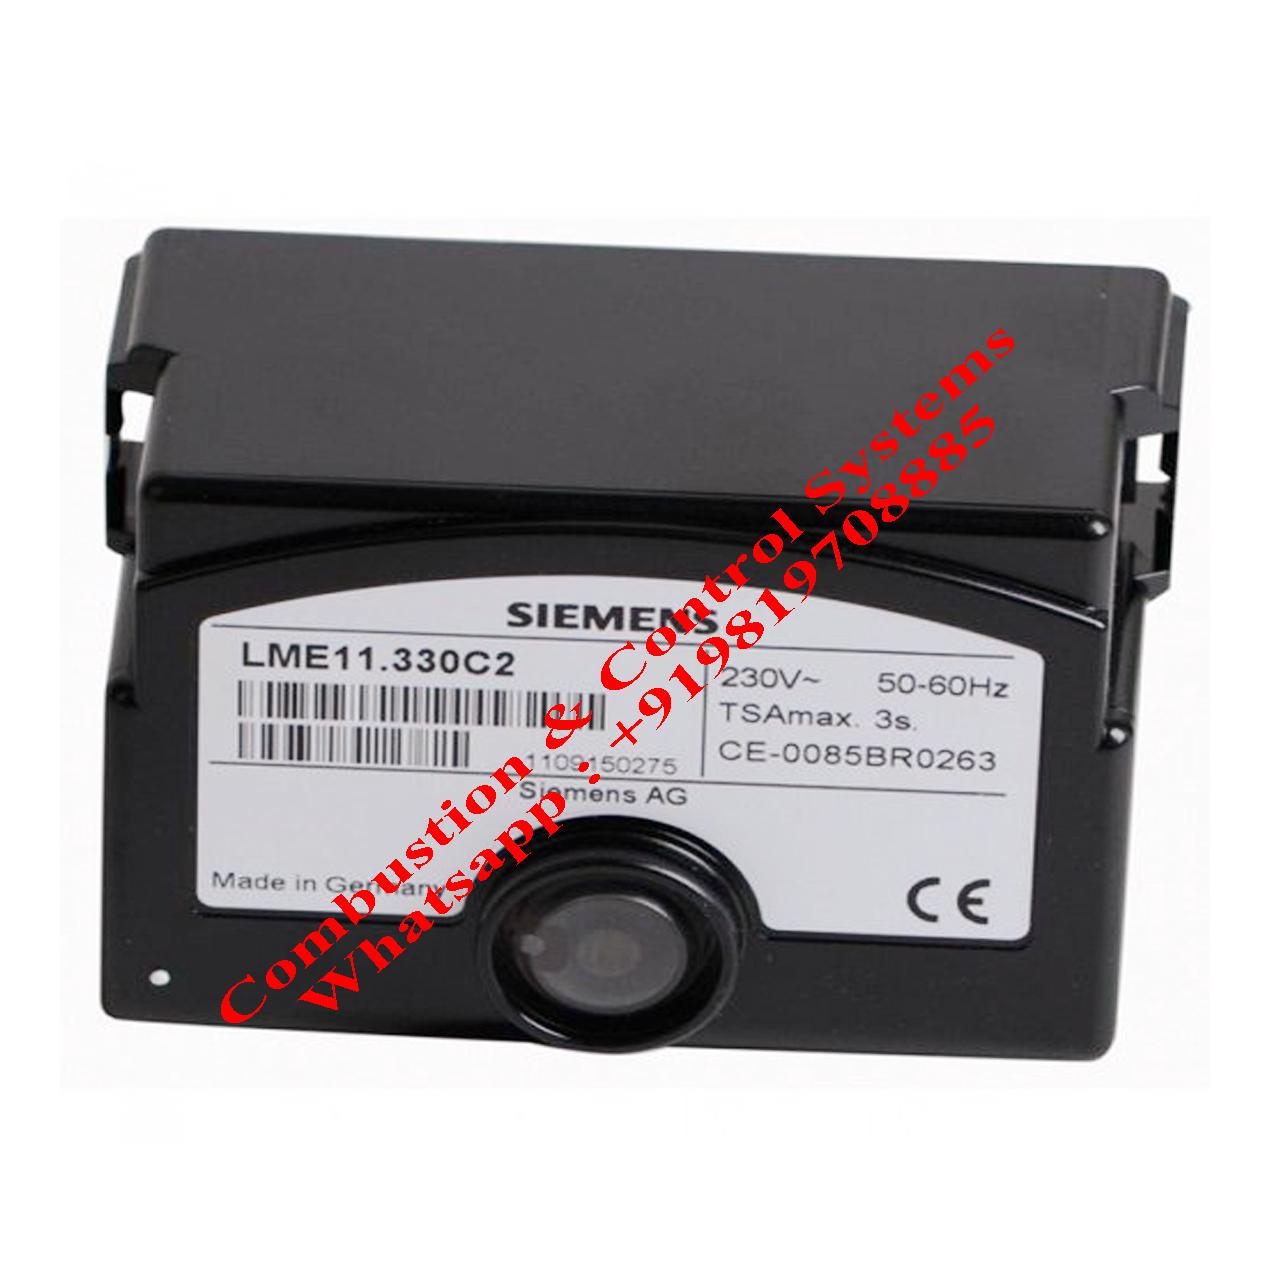 Siemens LME11.330 Burner Control Box